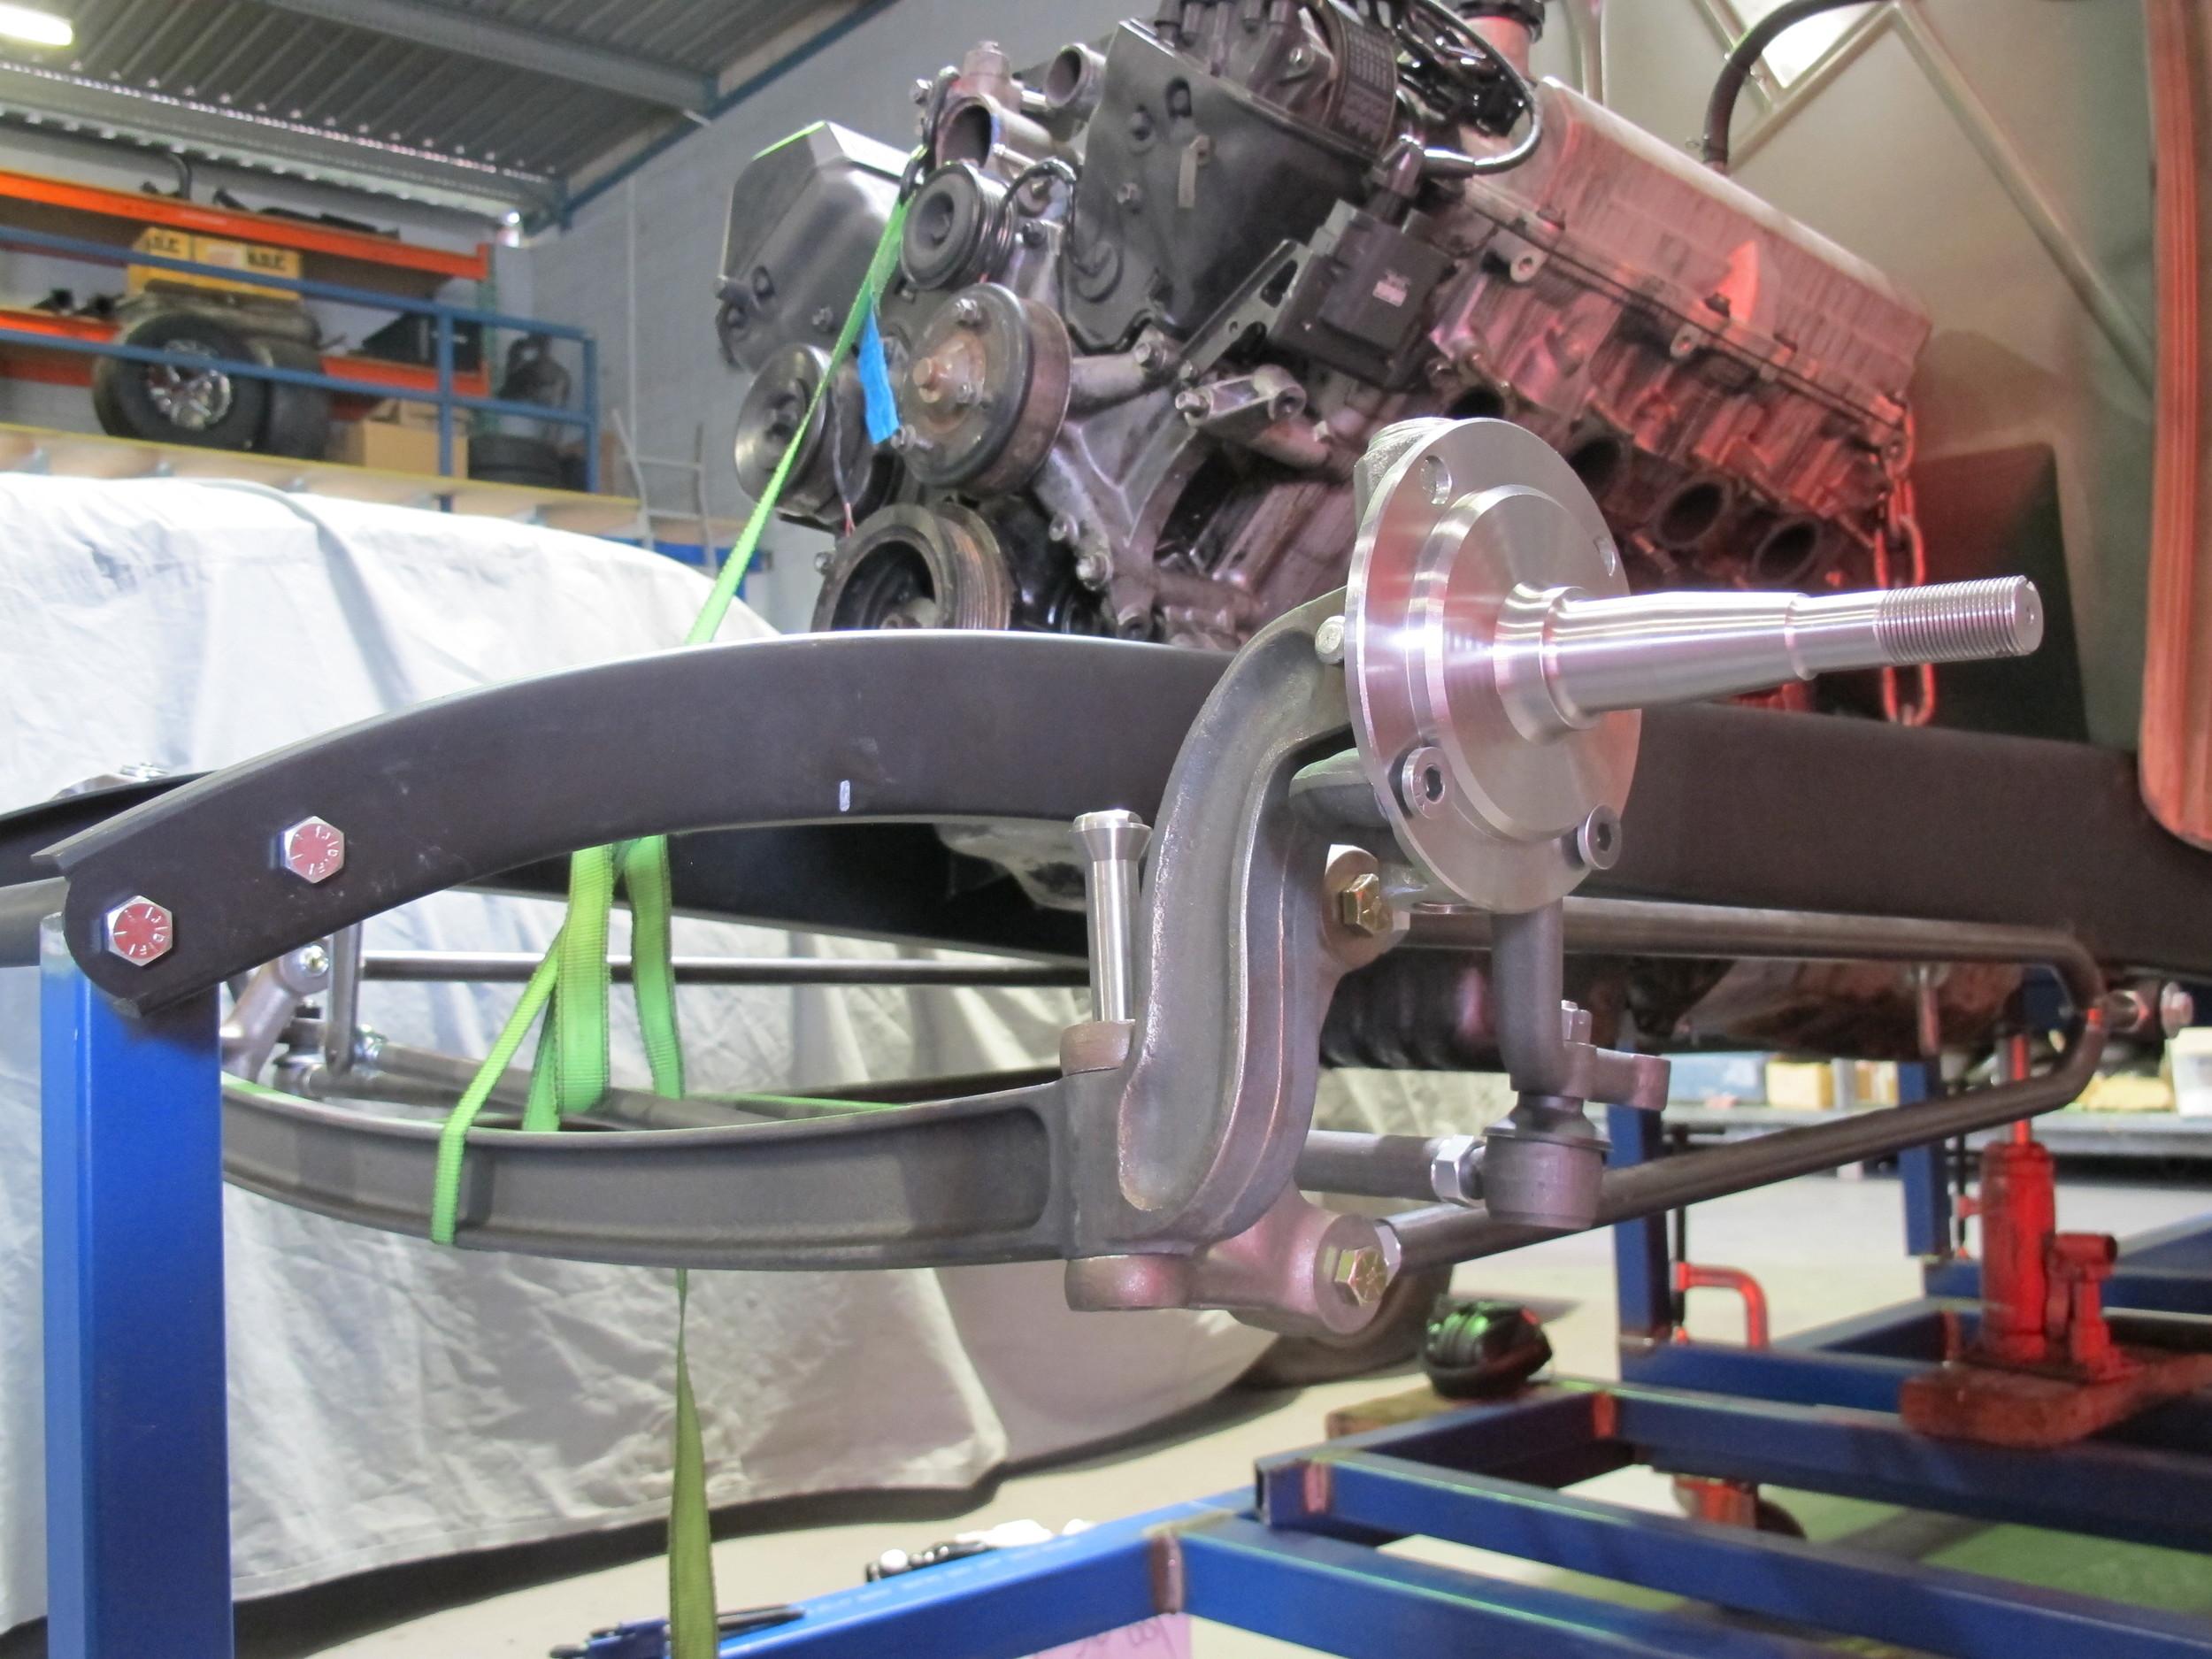 Ol' School Garage - 32 Roadster Hot Rod Build (5).JPG